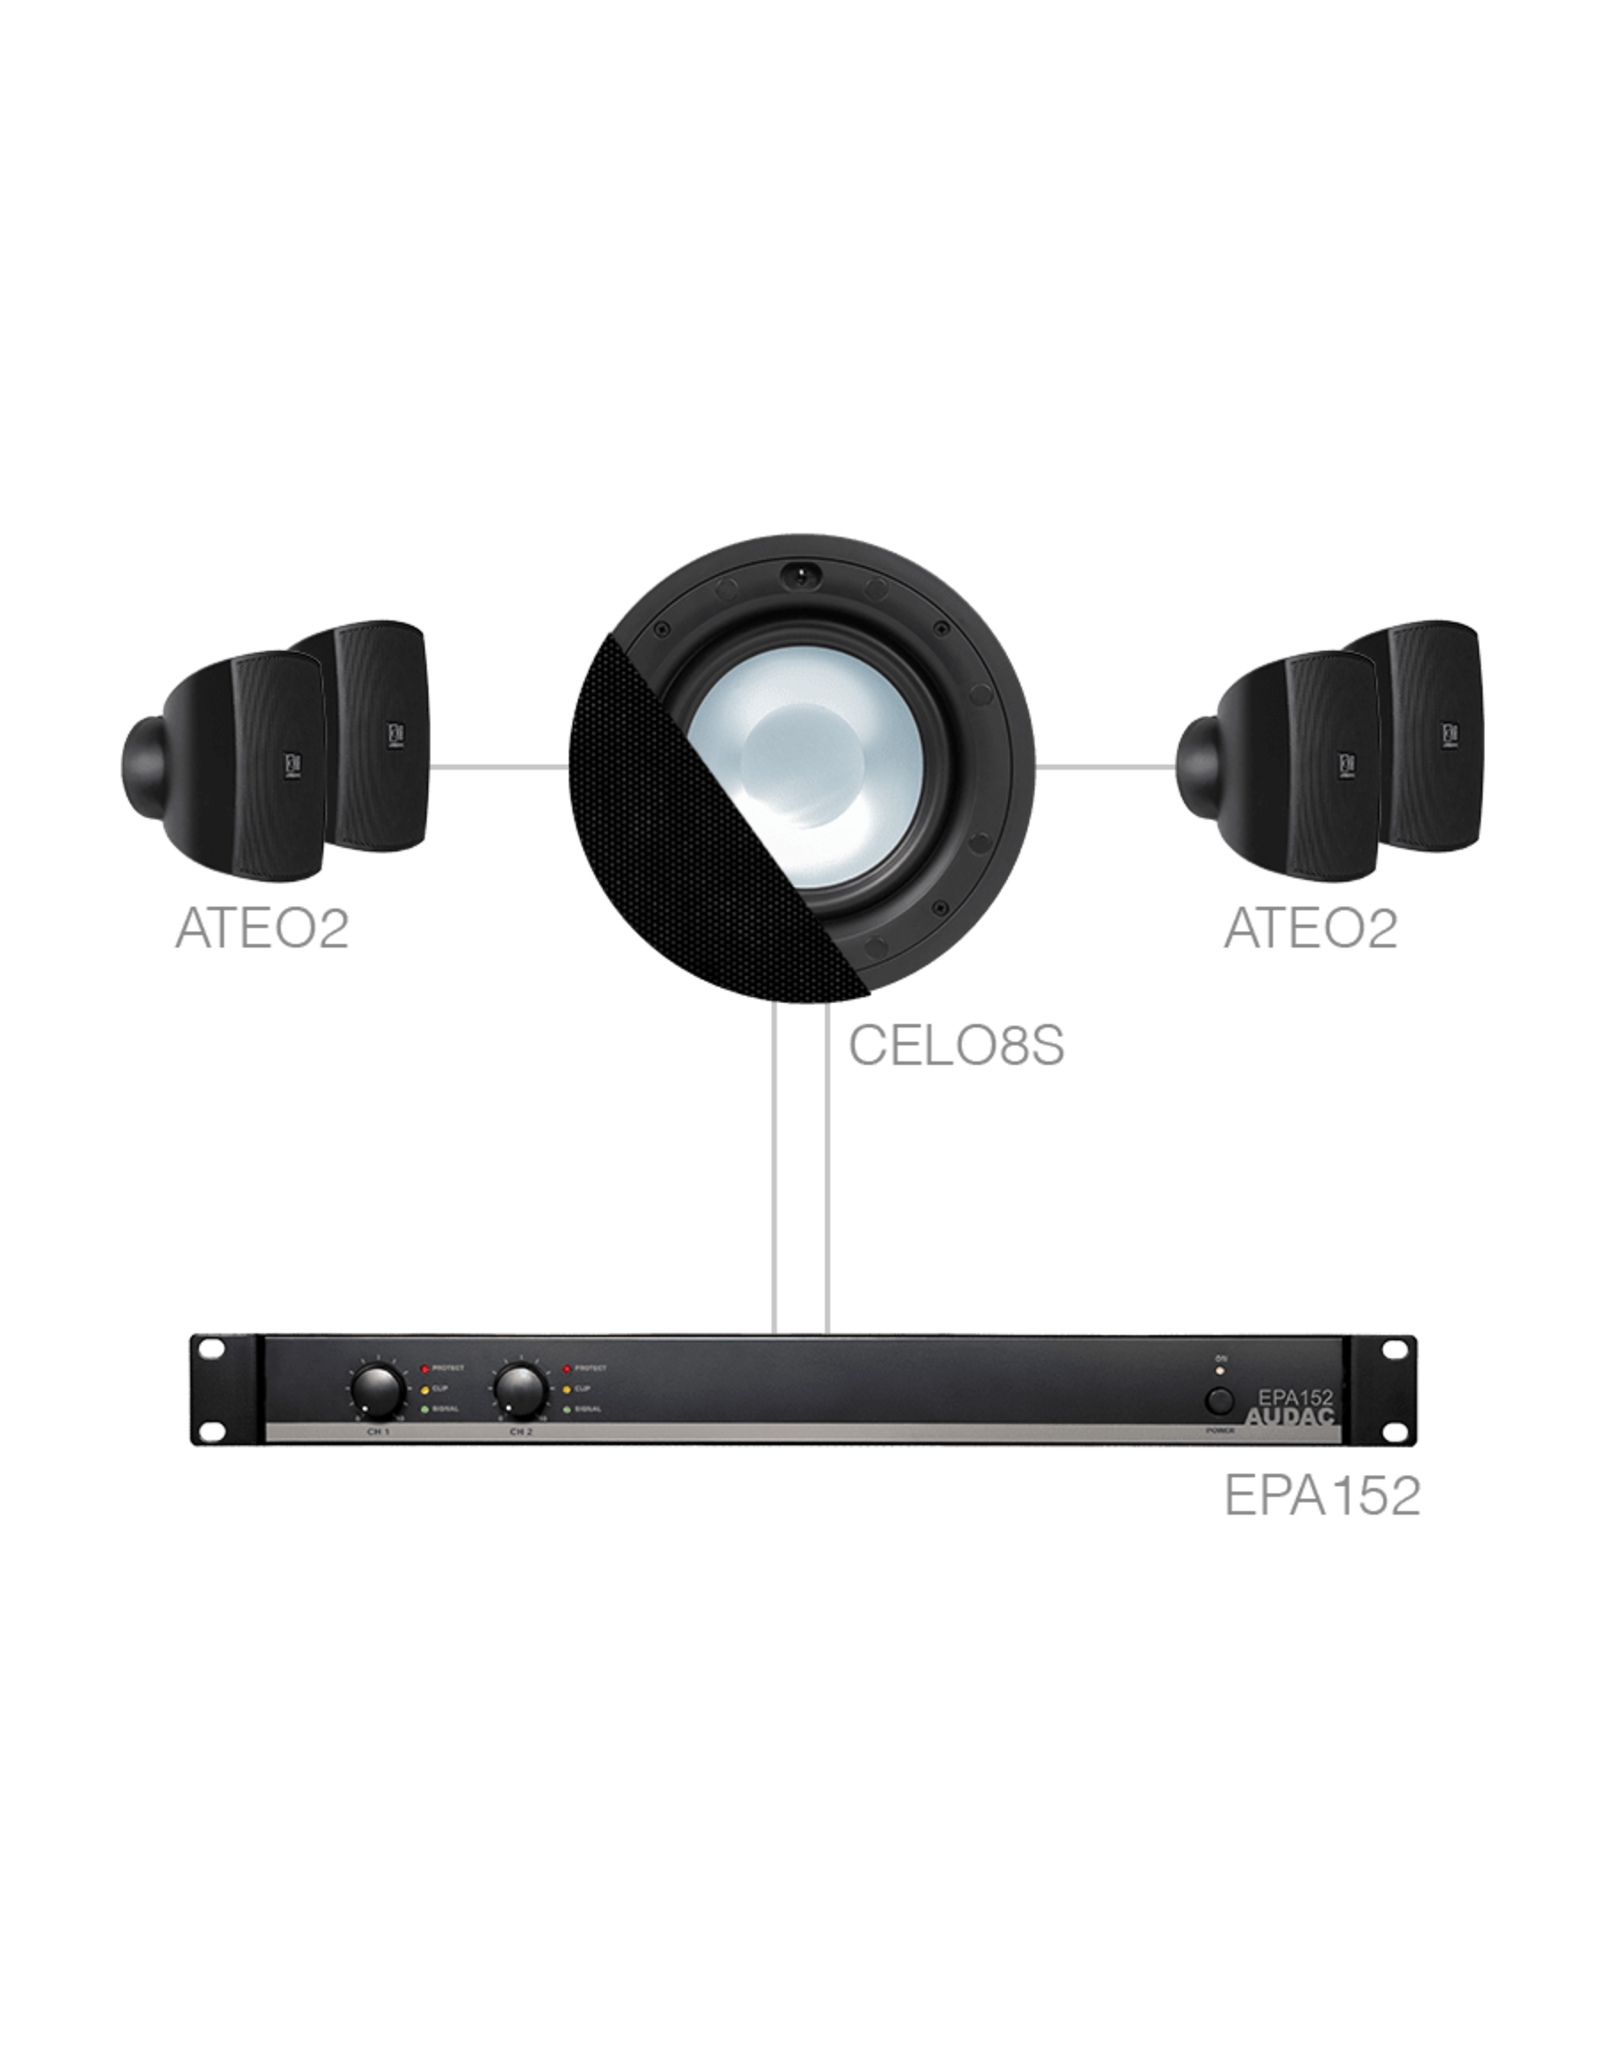 Audac 4 x ATEO2 + CELO8S + EPA152 Black